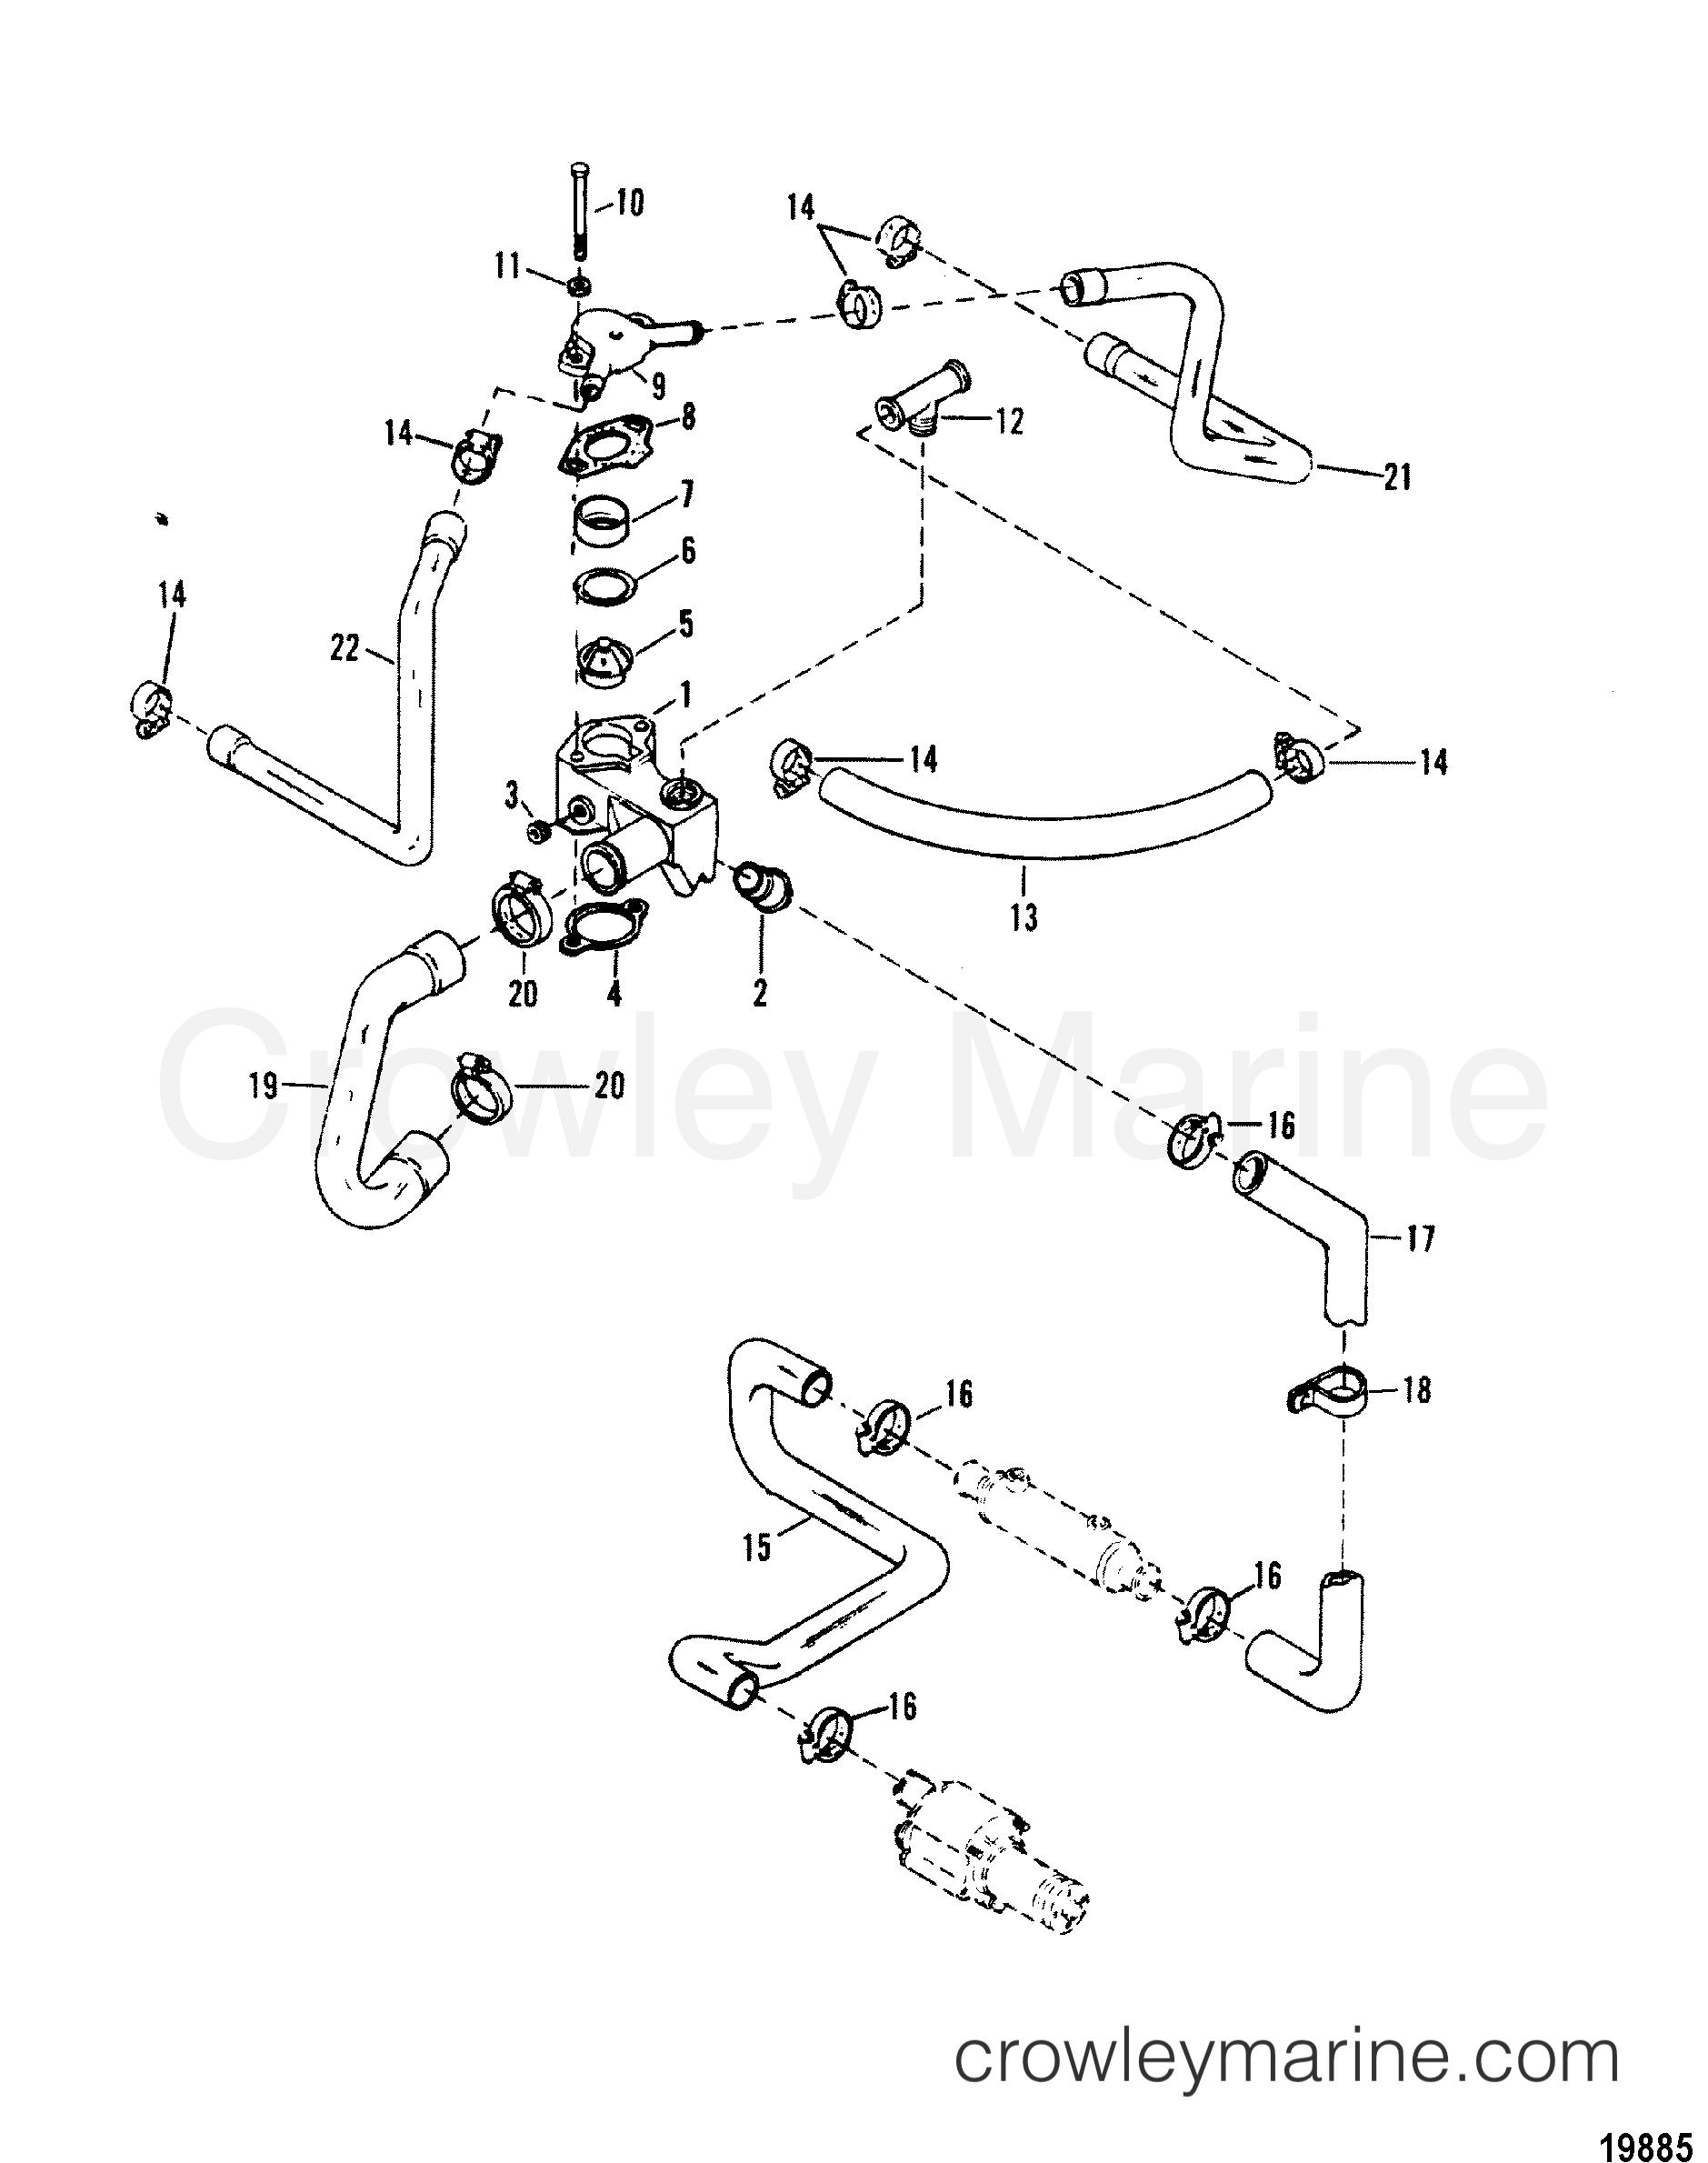 Mercruiser 50 Engine Diagram Thermostat Reveolution Of Wiring Boat 454 Housing Standard Cooling Design I 1988 Mercury Rh Crowleymarine Com Diagrams